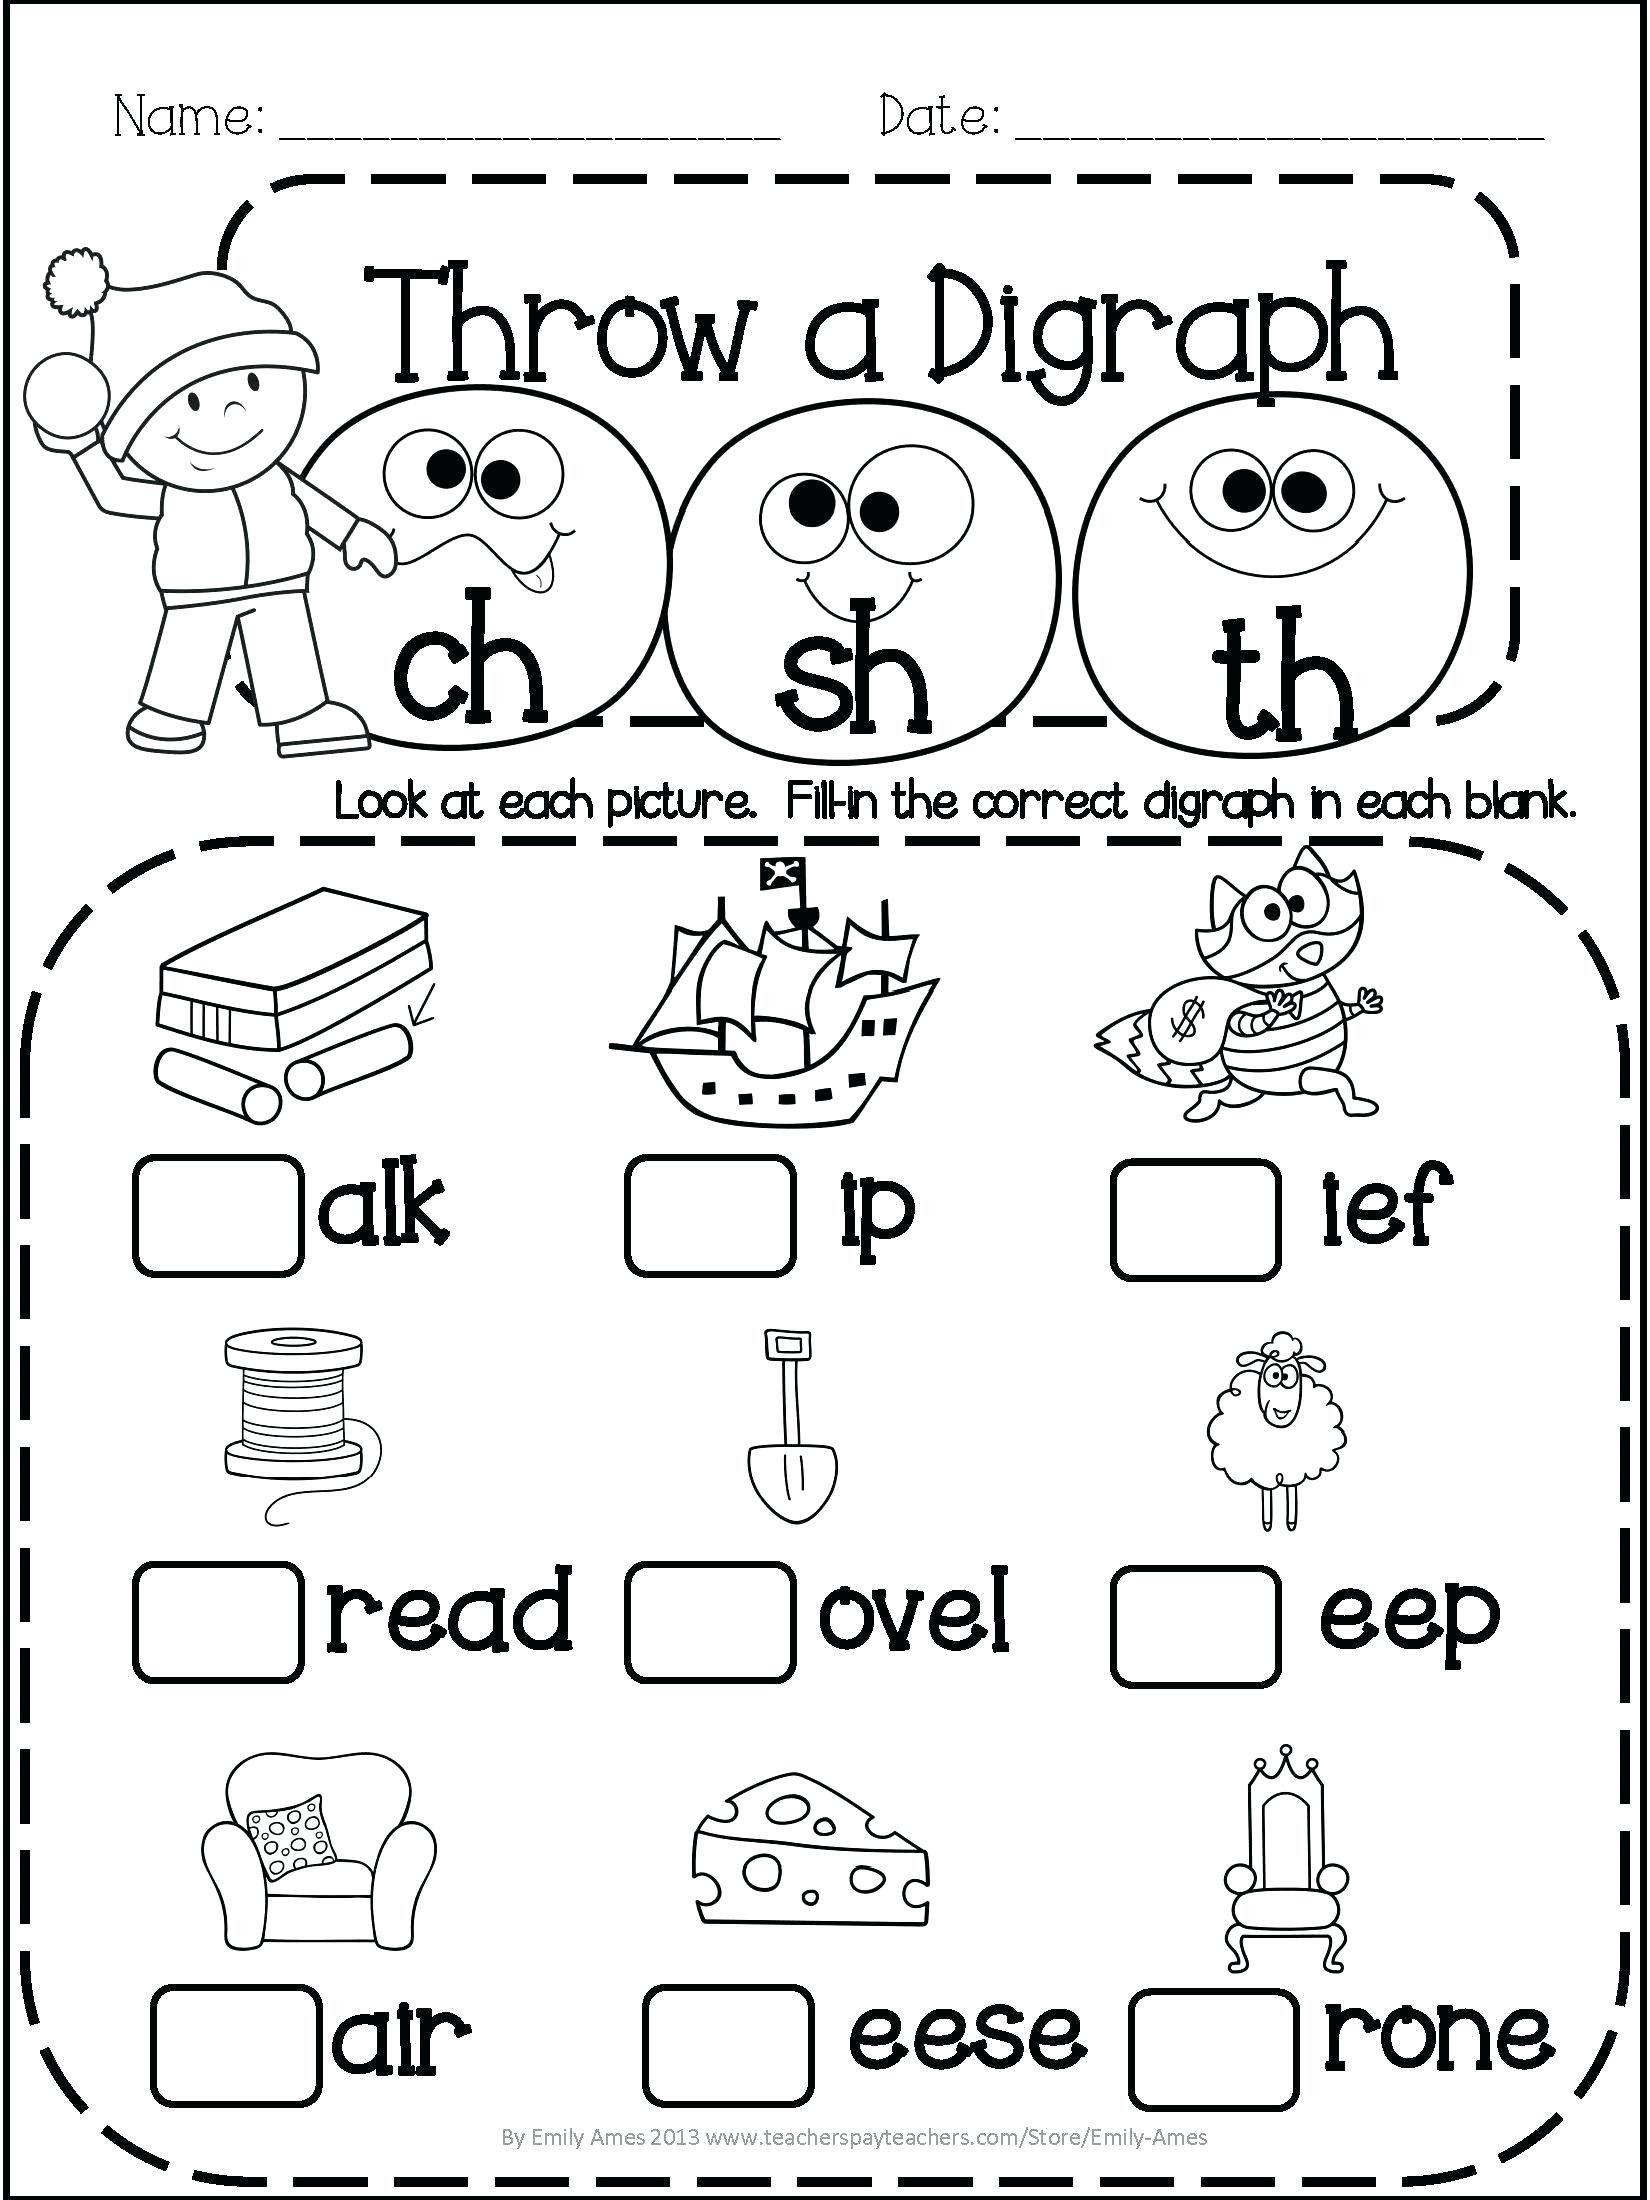 3 Free Math Worksheets First Grade 1 Subtraction Single Digit Subtraction Missing Number Blends Worksheets Kindergarten Phonics Worksheets Phonics Kindergarten